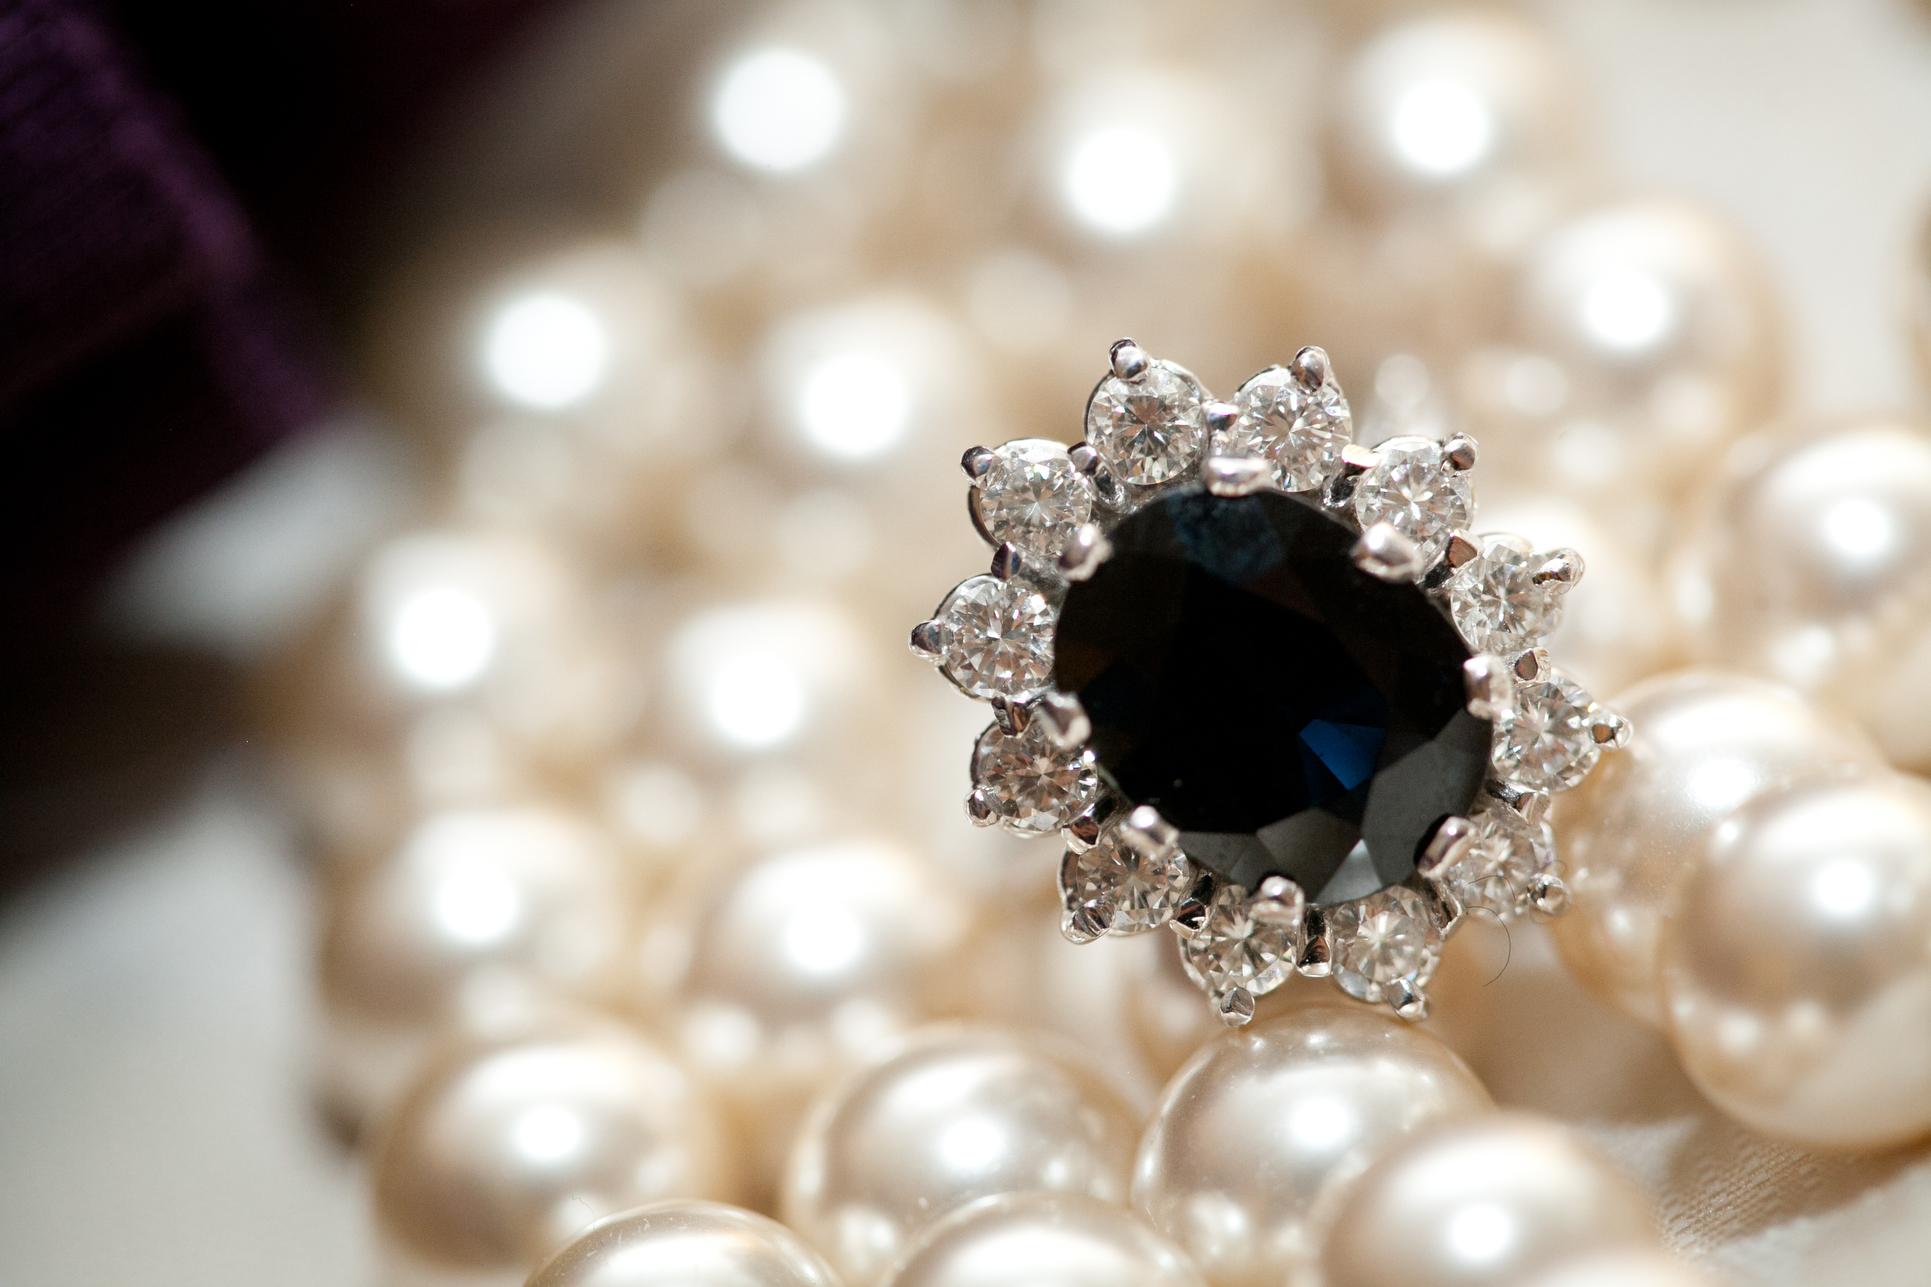 03 Downtown Club Brides Jewelery Details.JPG